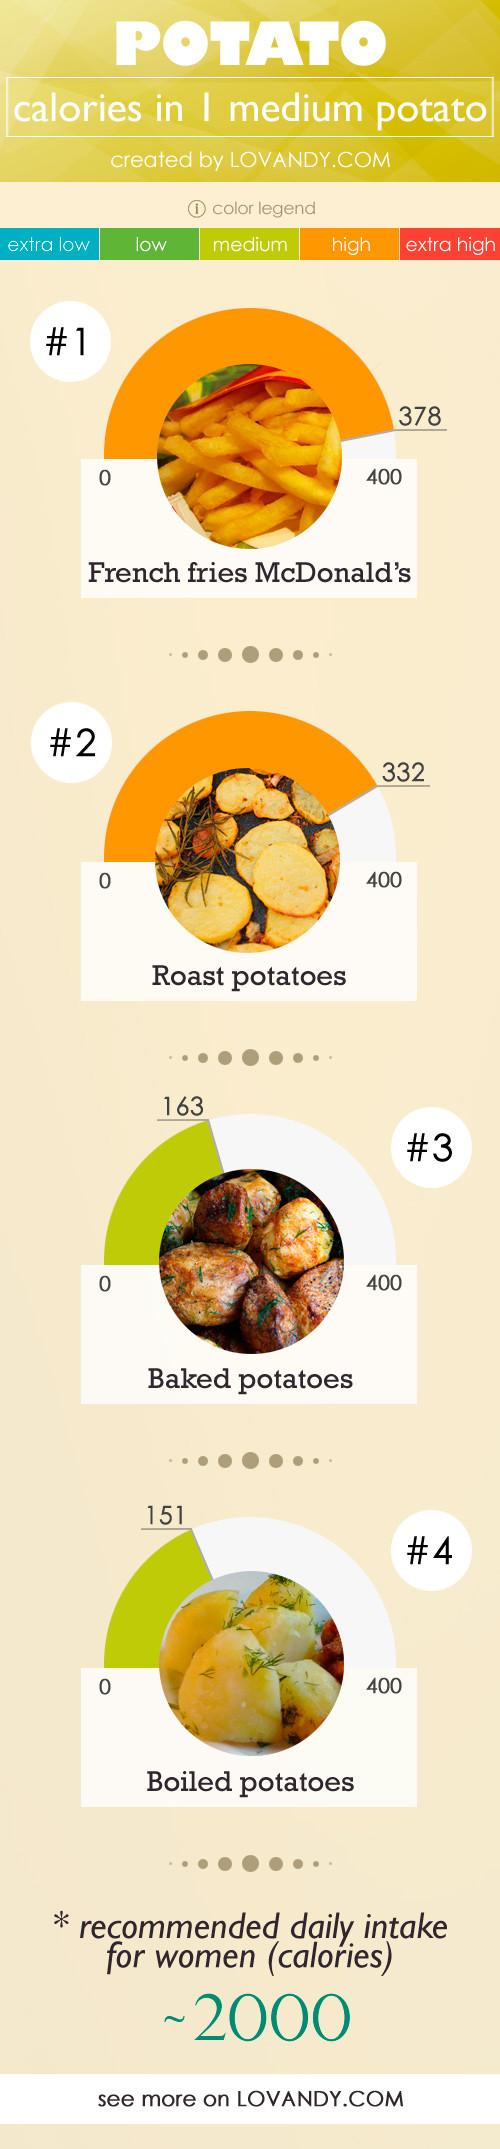 Calories In Roasted Potatoes  Potato Calories Baked Mashed Roast per 1 potato 100g